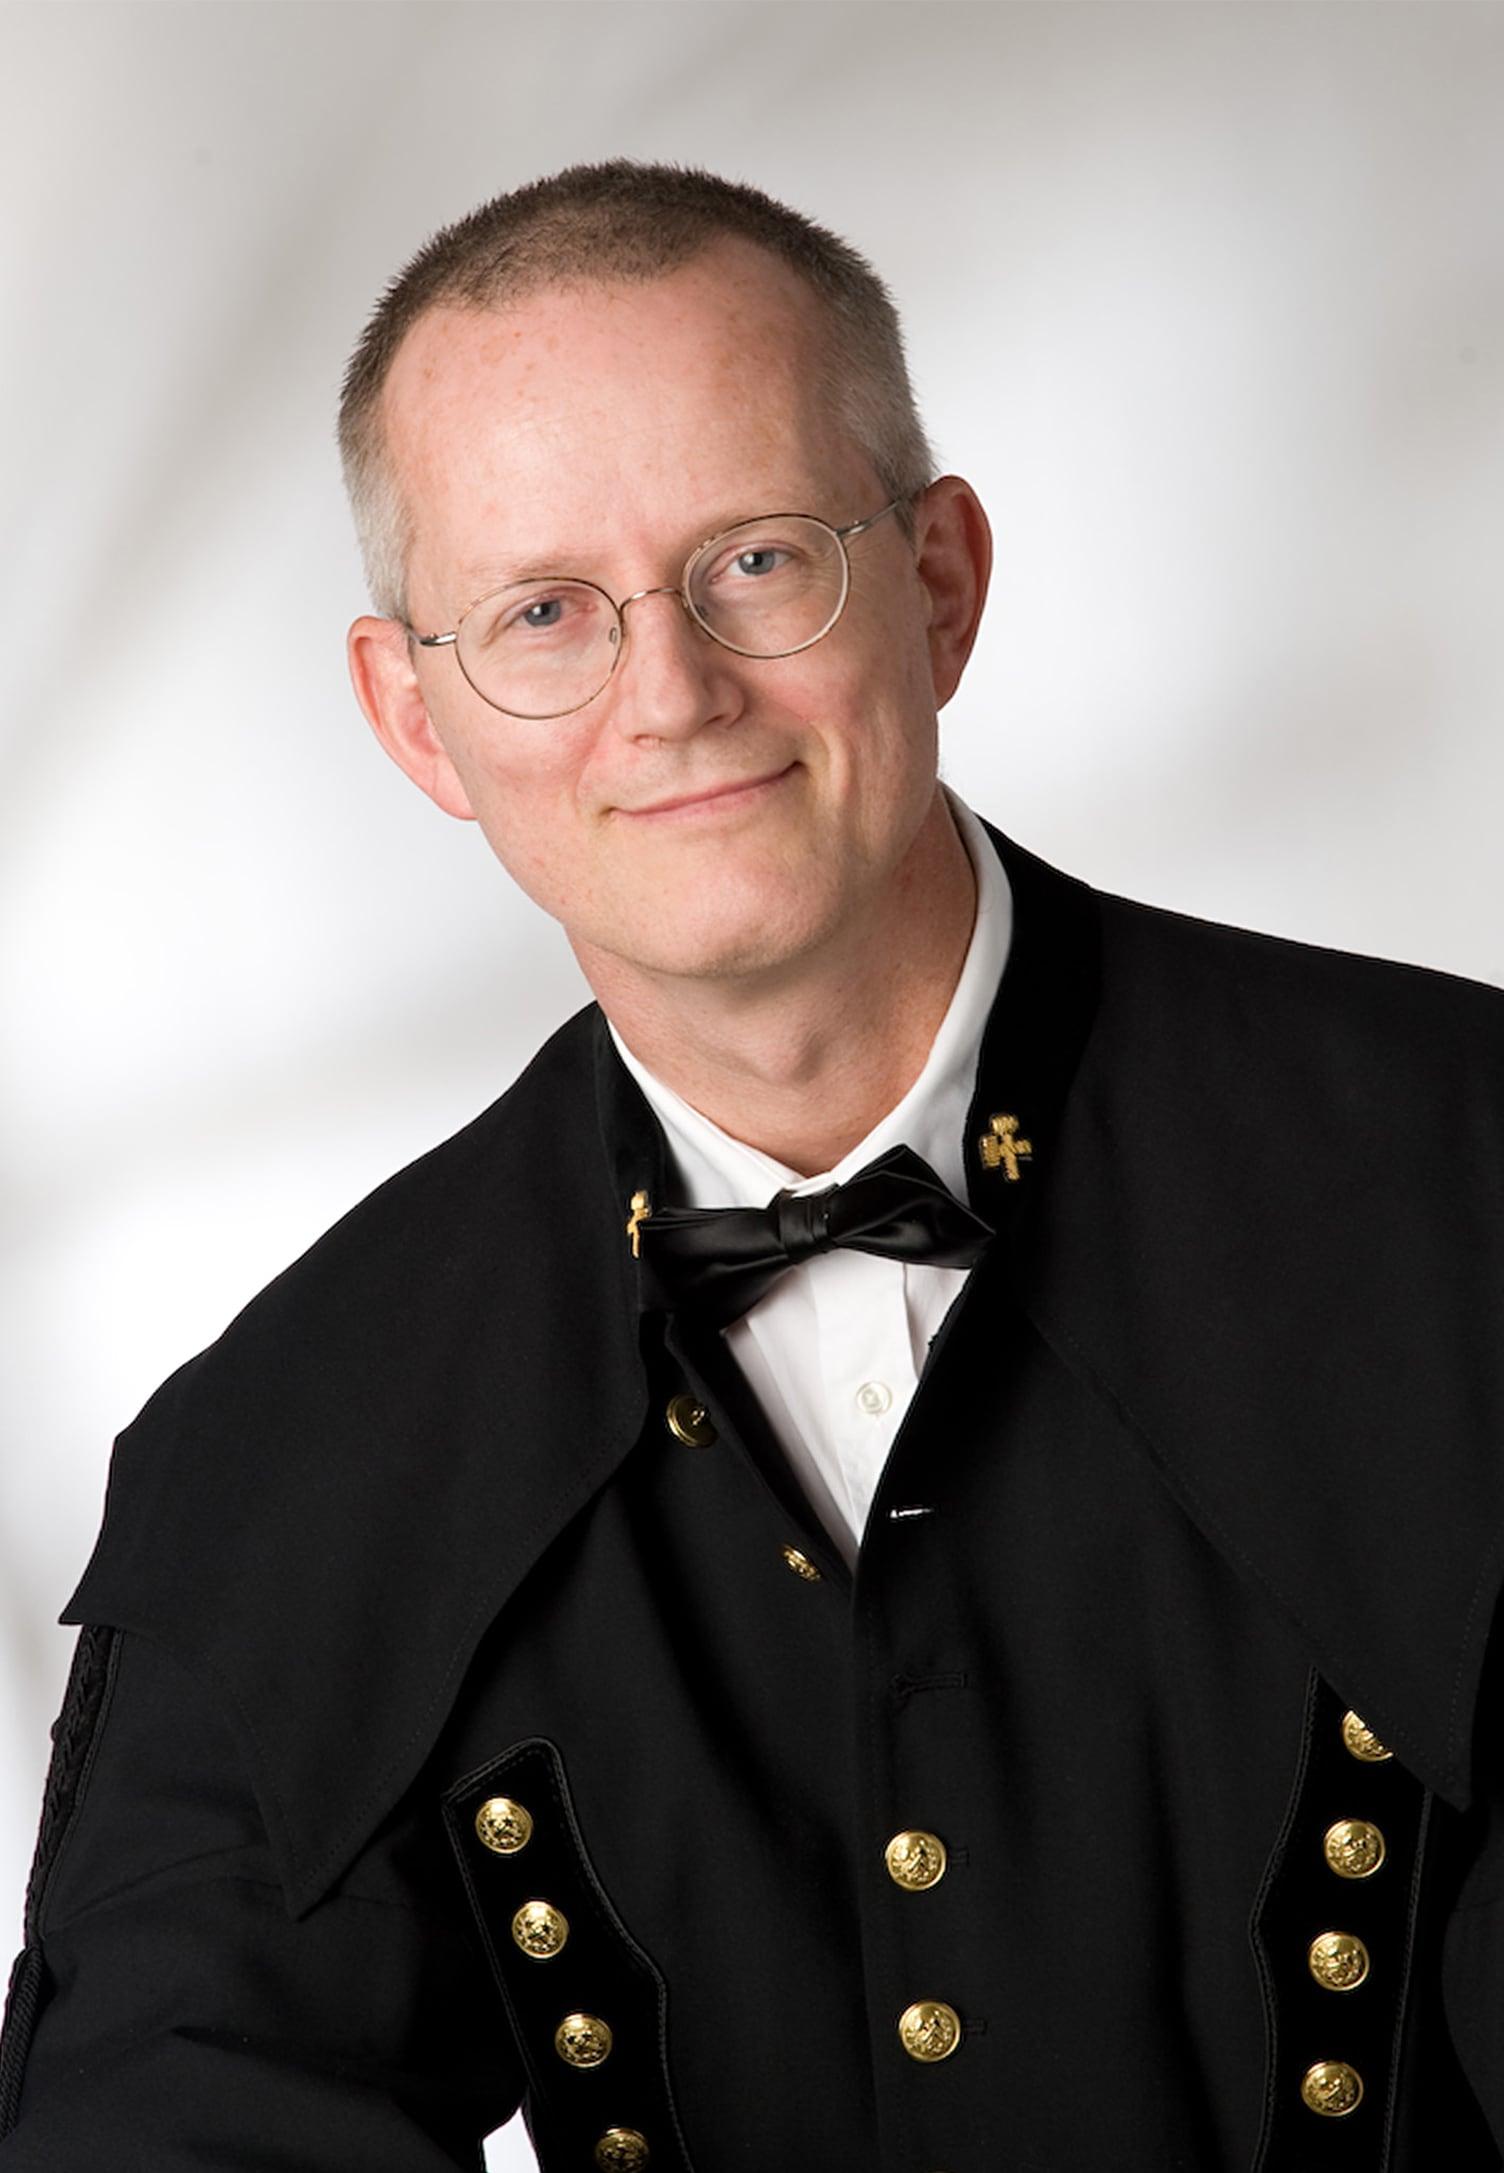 Roland Pomberger